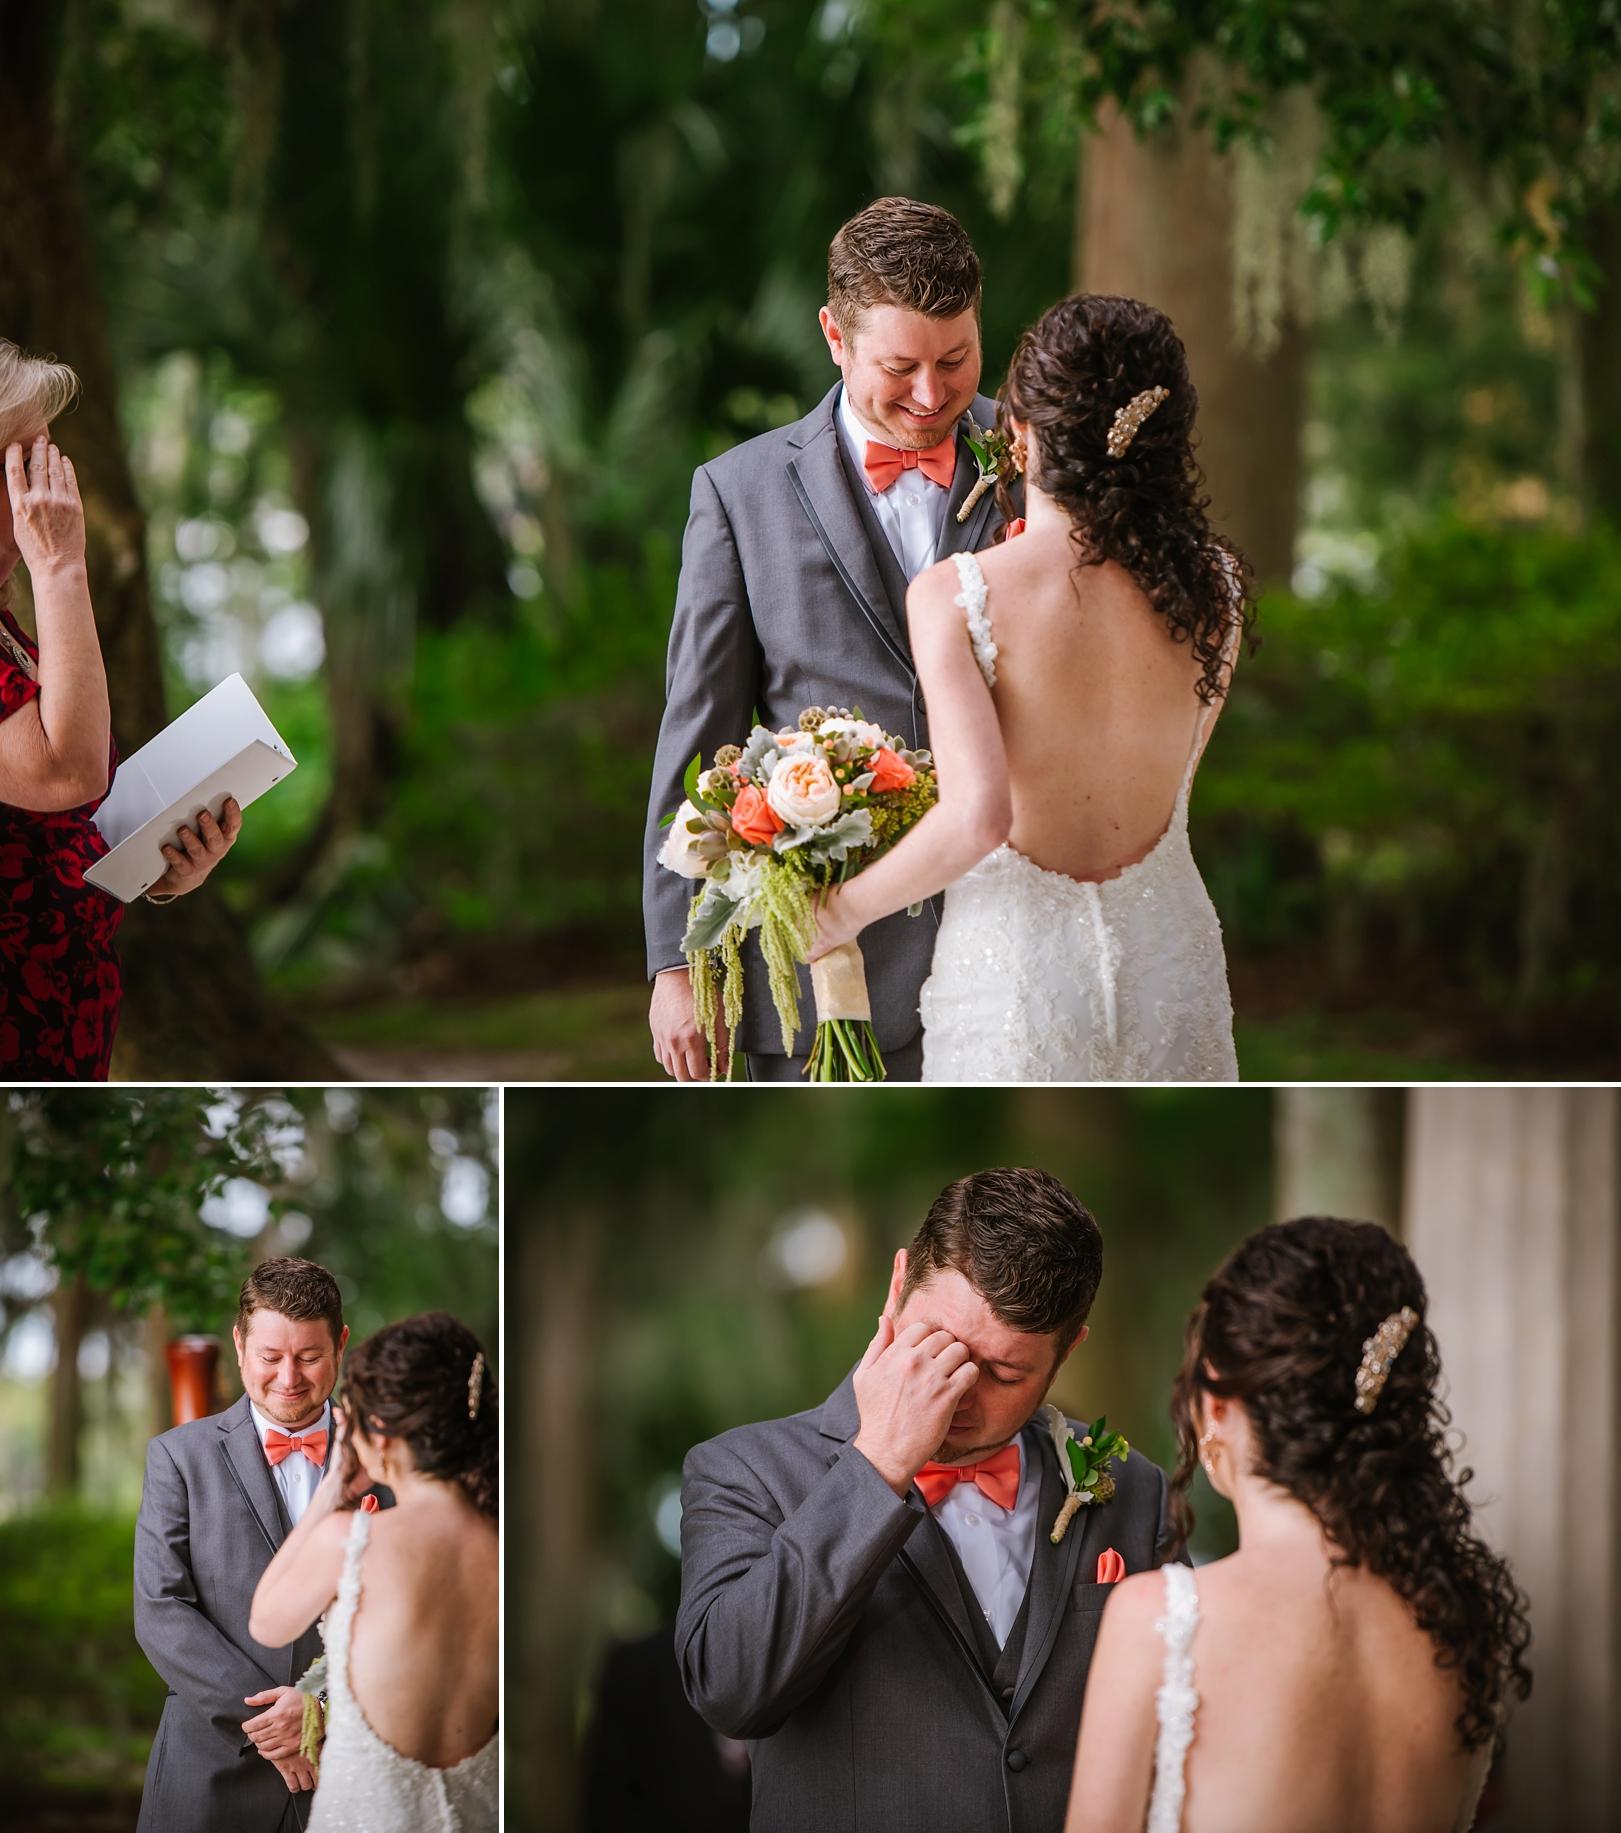 kraft-azalea-gardens-stylish-elopment-wedding-photography_0012.jpg